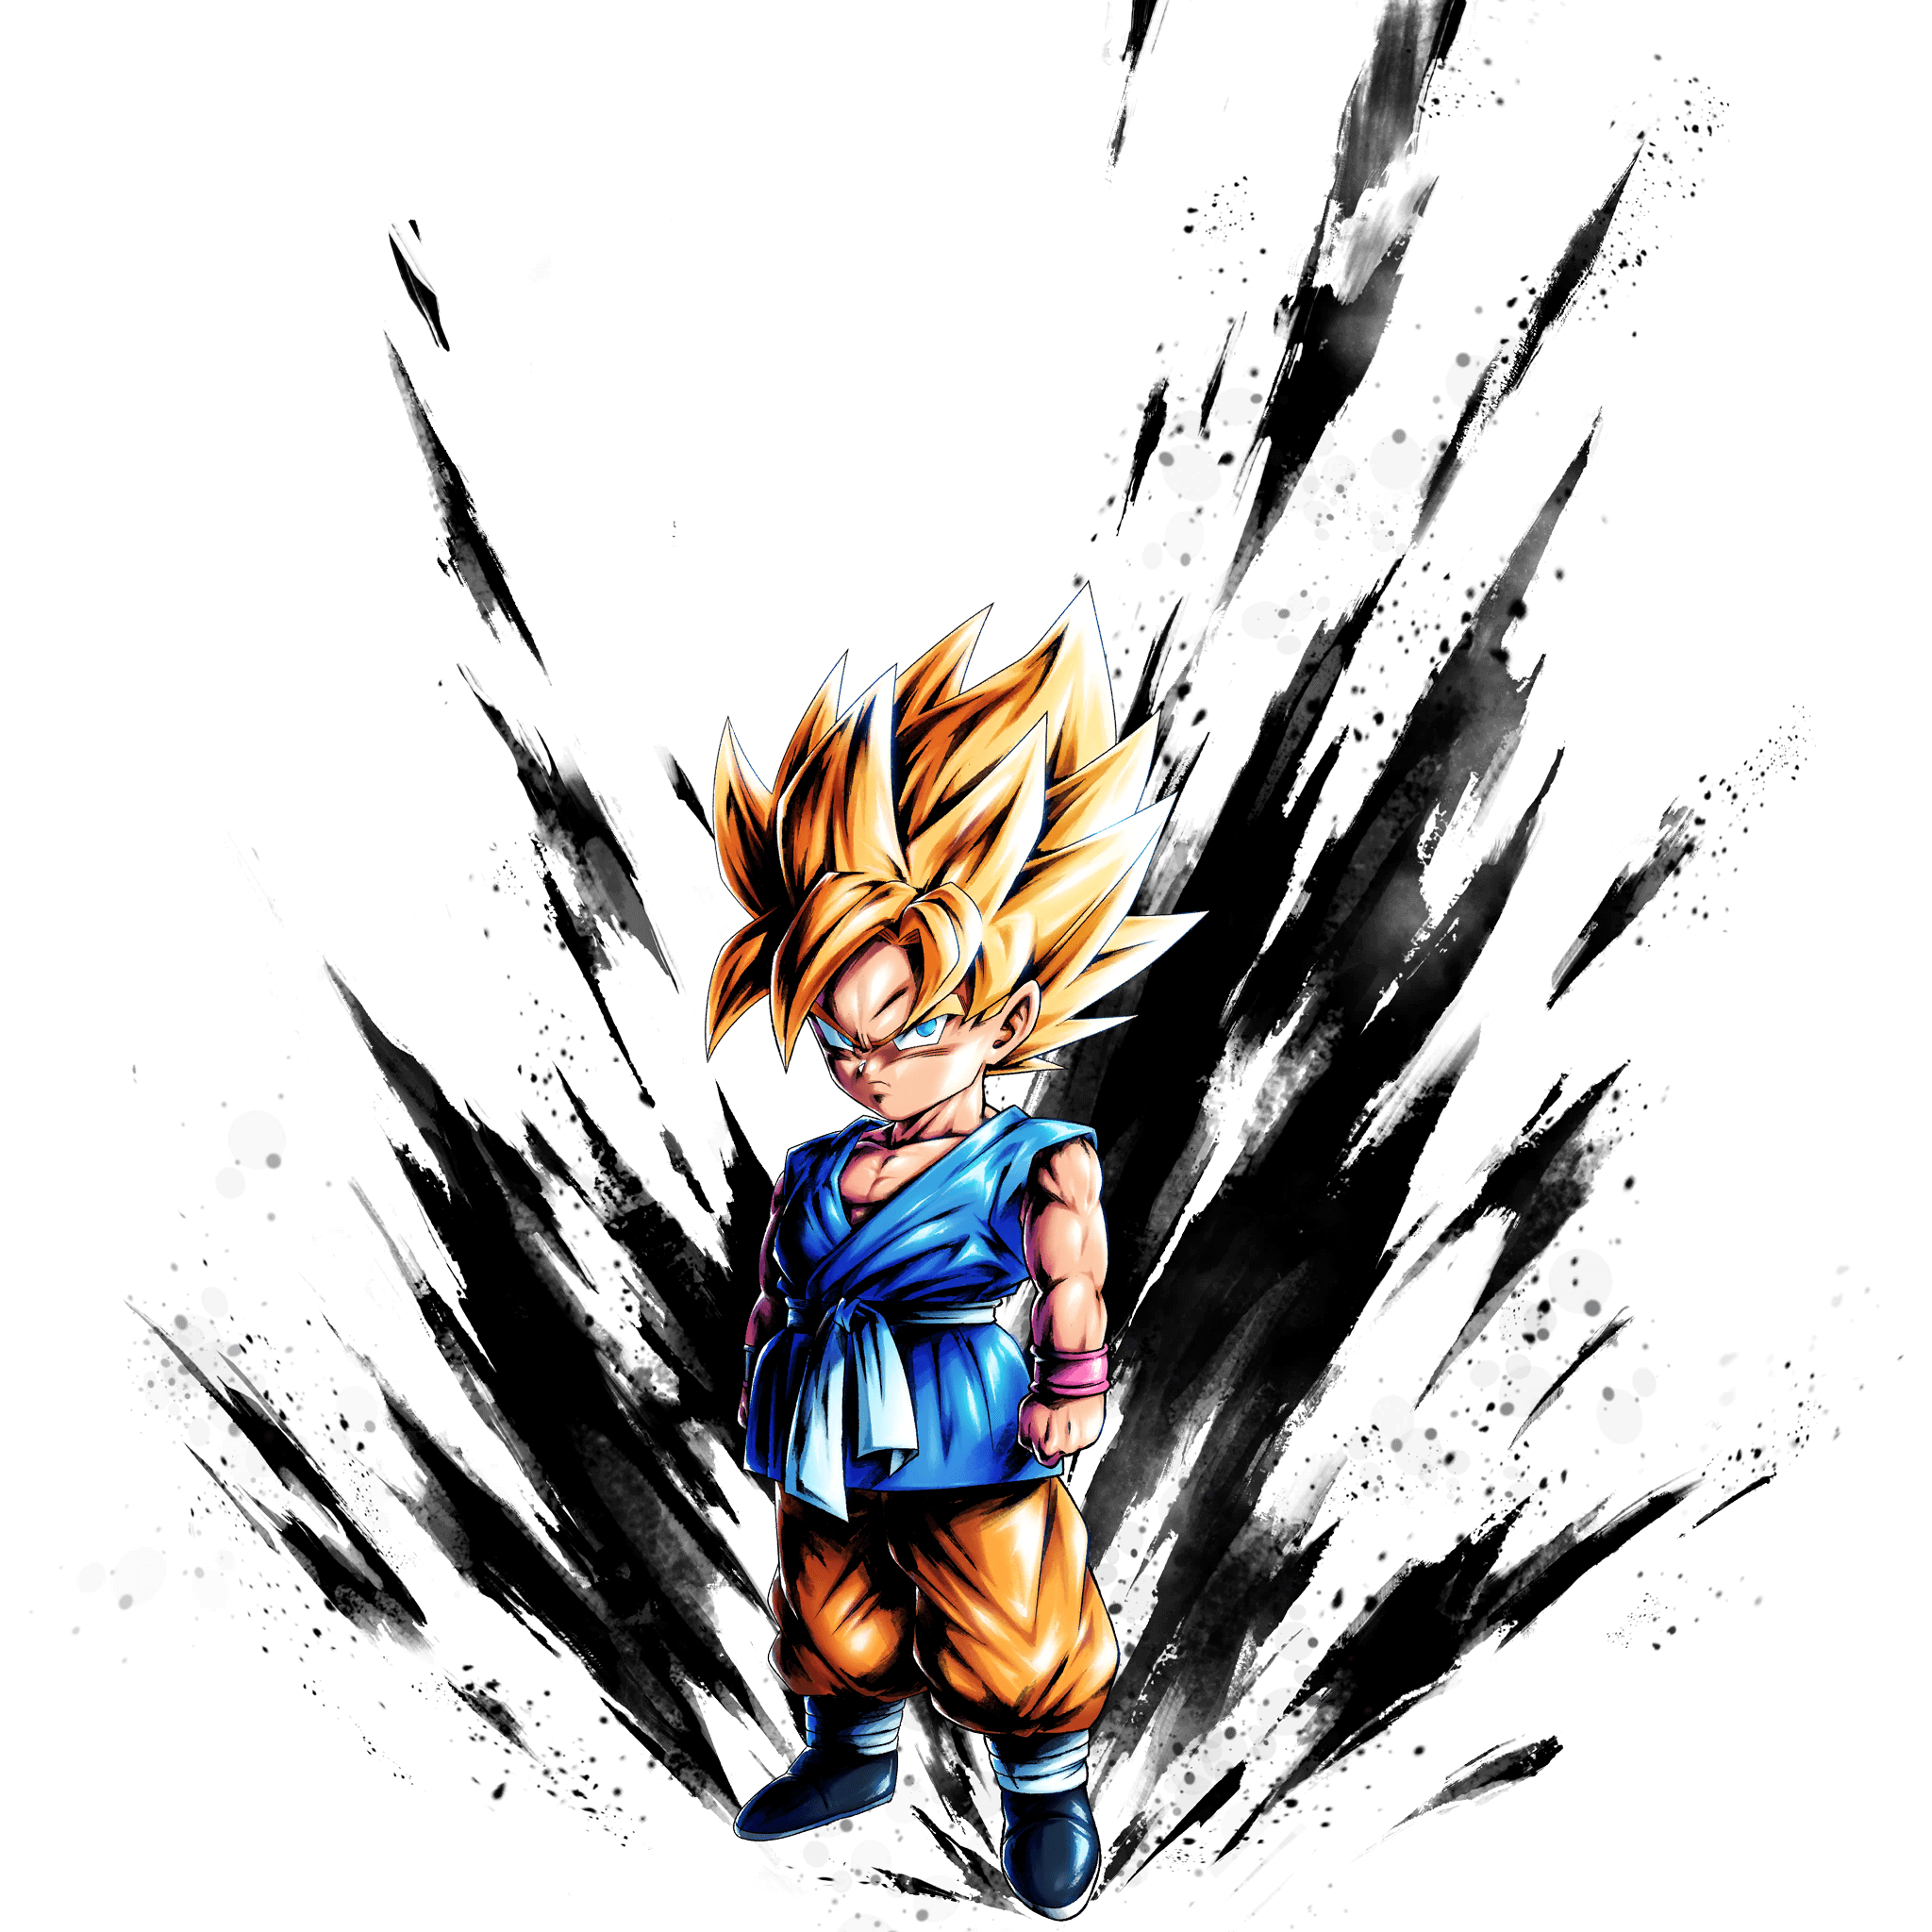 2048x2048 Sp Super Saiyan Kid Goku